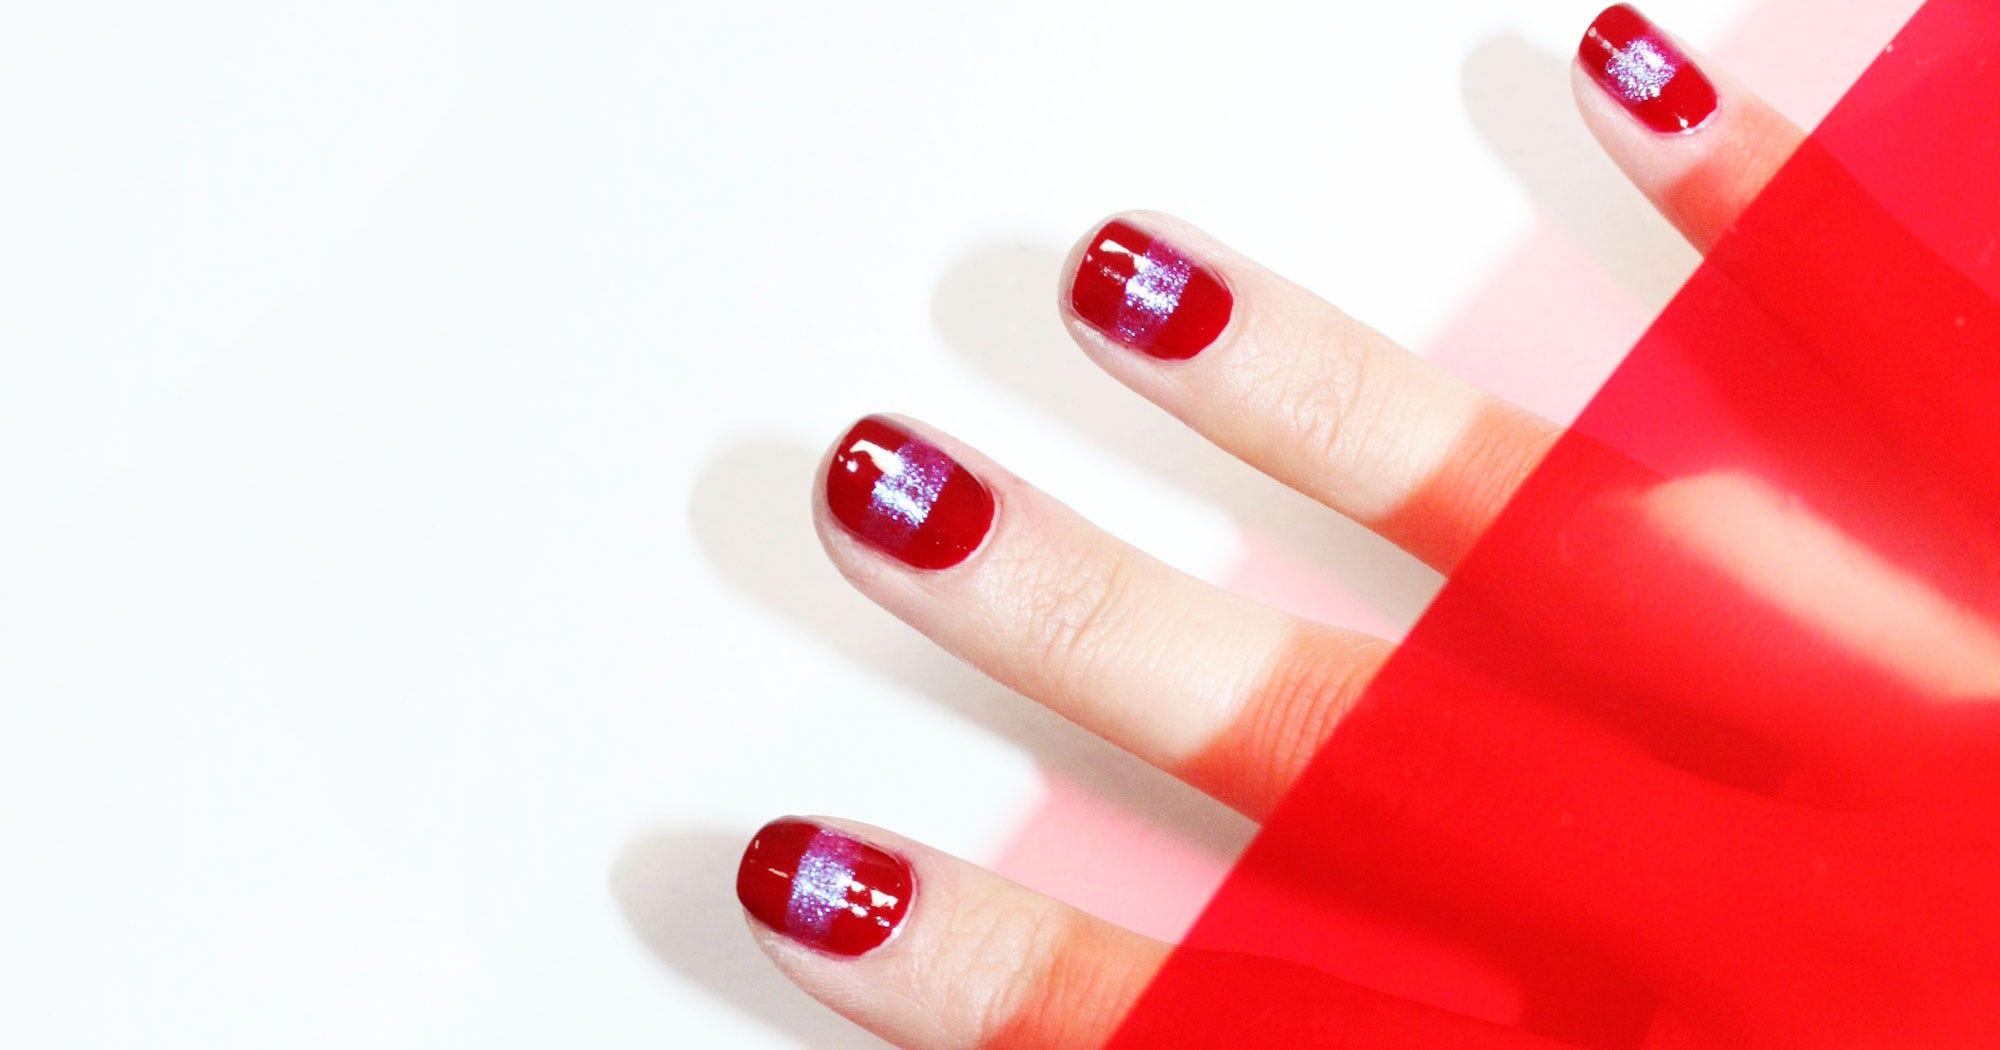 How To Layer Nail Colors - Mixing Polish